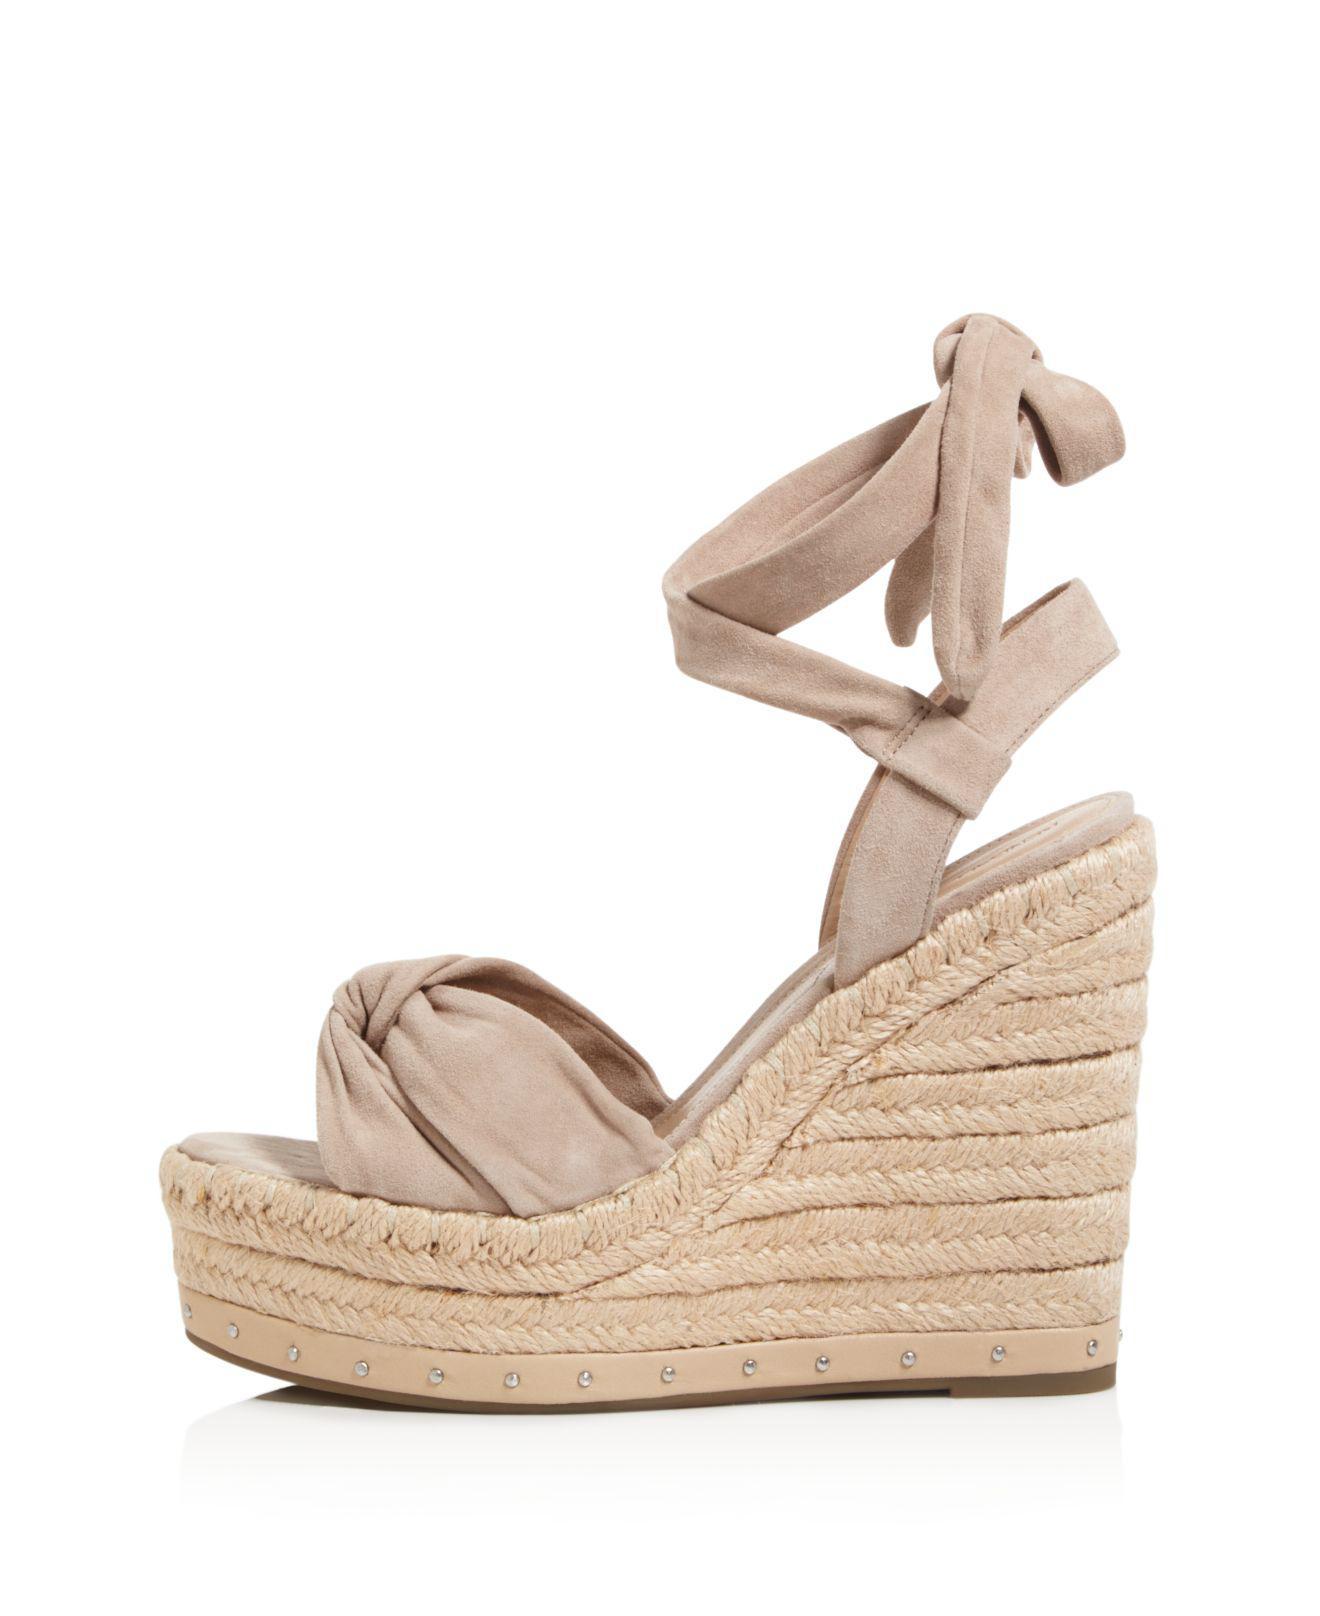 c19c296fc3d4 Lyst - Kendall + Kylie Grayce Espadrille Platform Wedge Sandals in ...